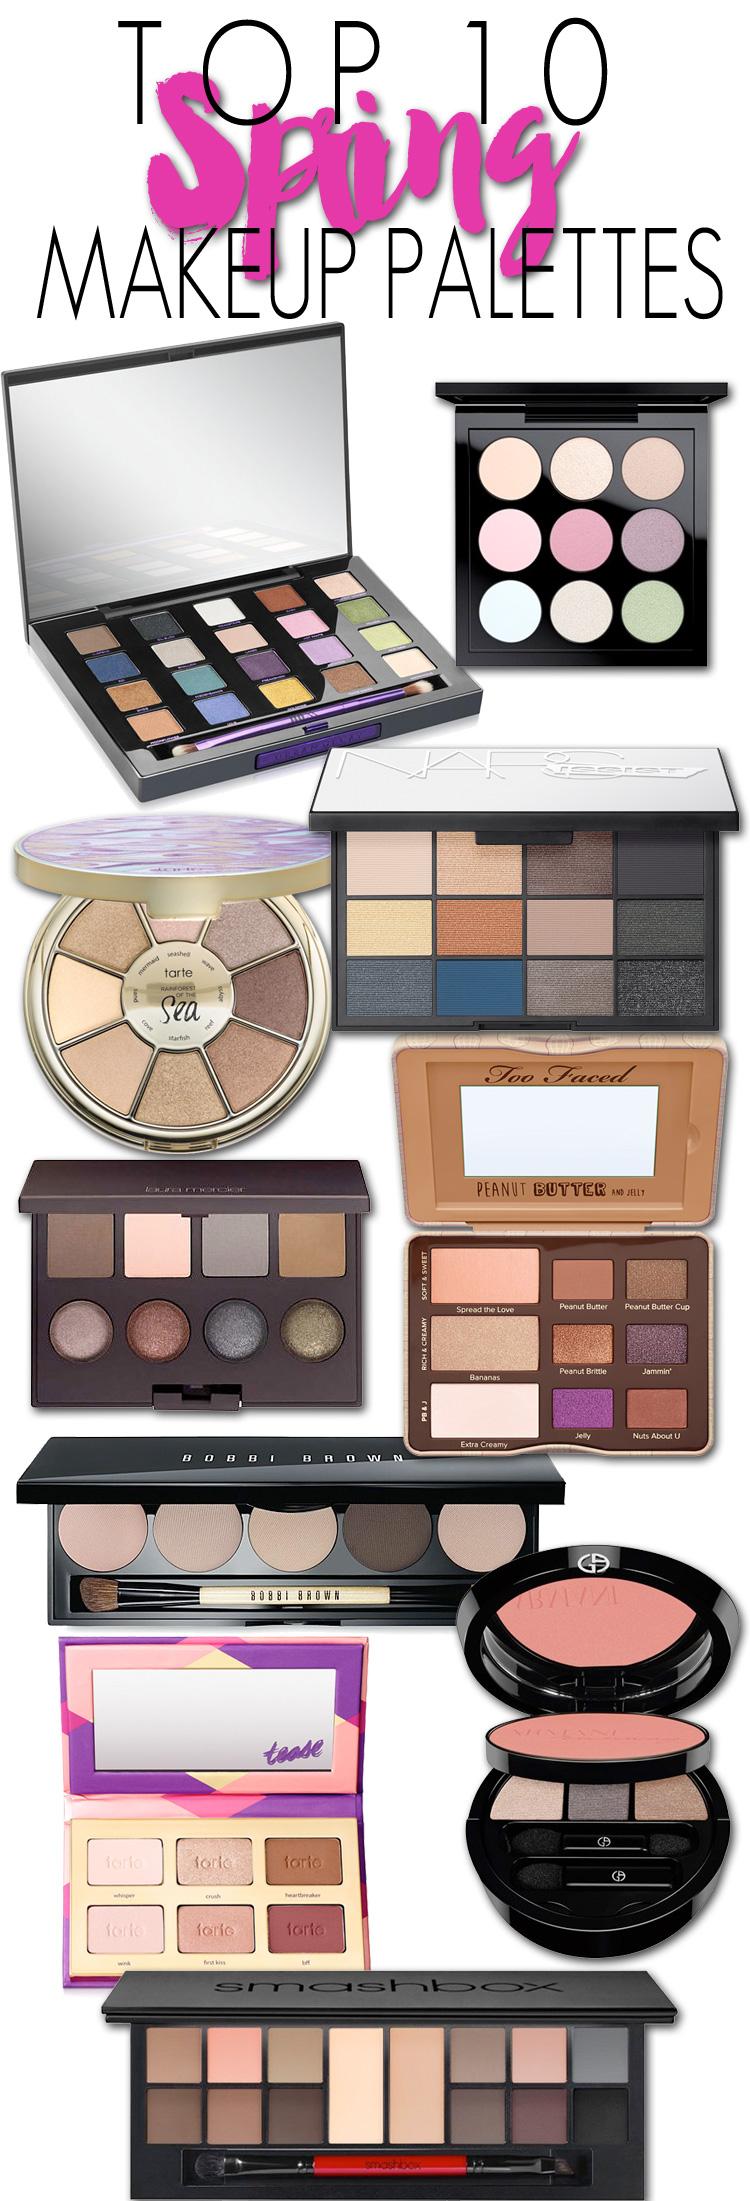 Top 10 Spring Makeup Palettes